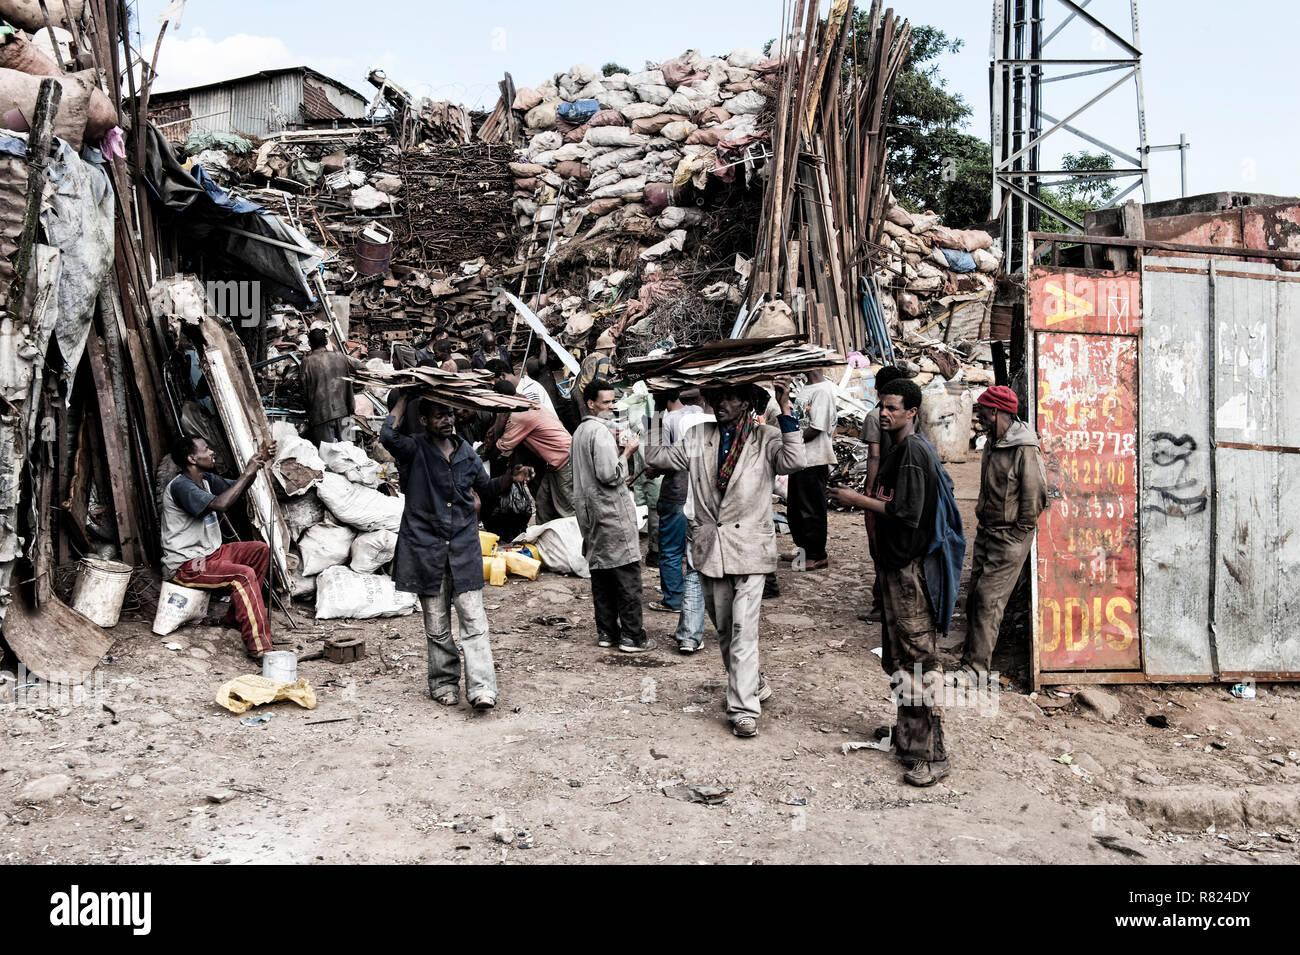 Metals trade, market street scene, Mercato of Addis Ababa, Addis Ababa, Oromia Region, Ethiopia - Stock Image